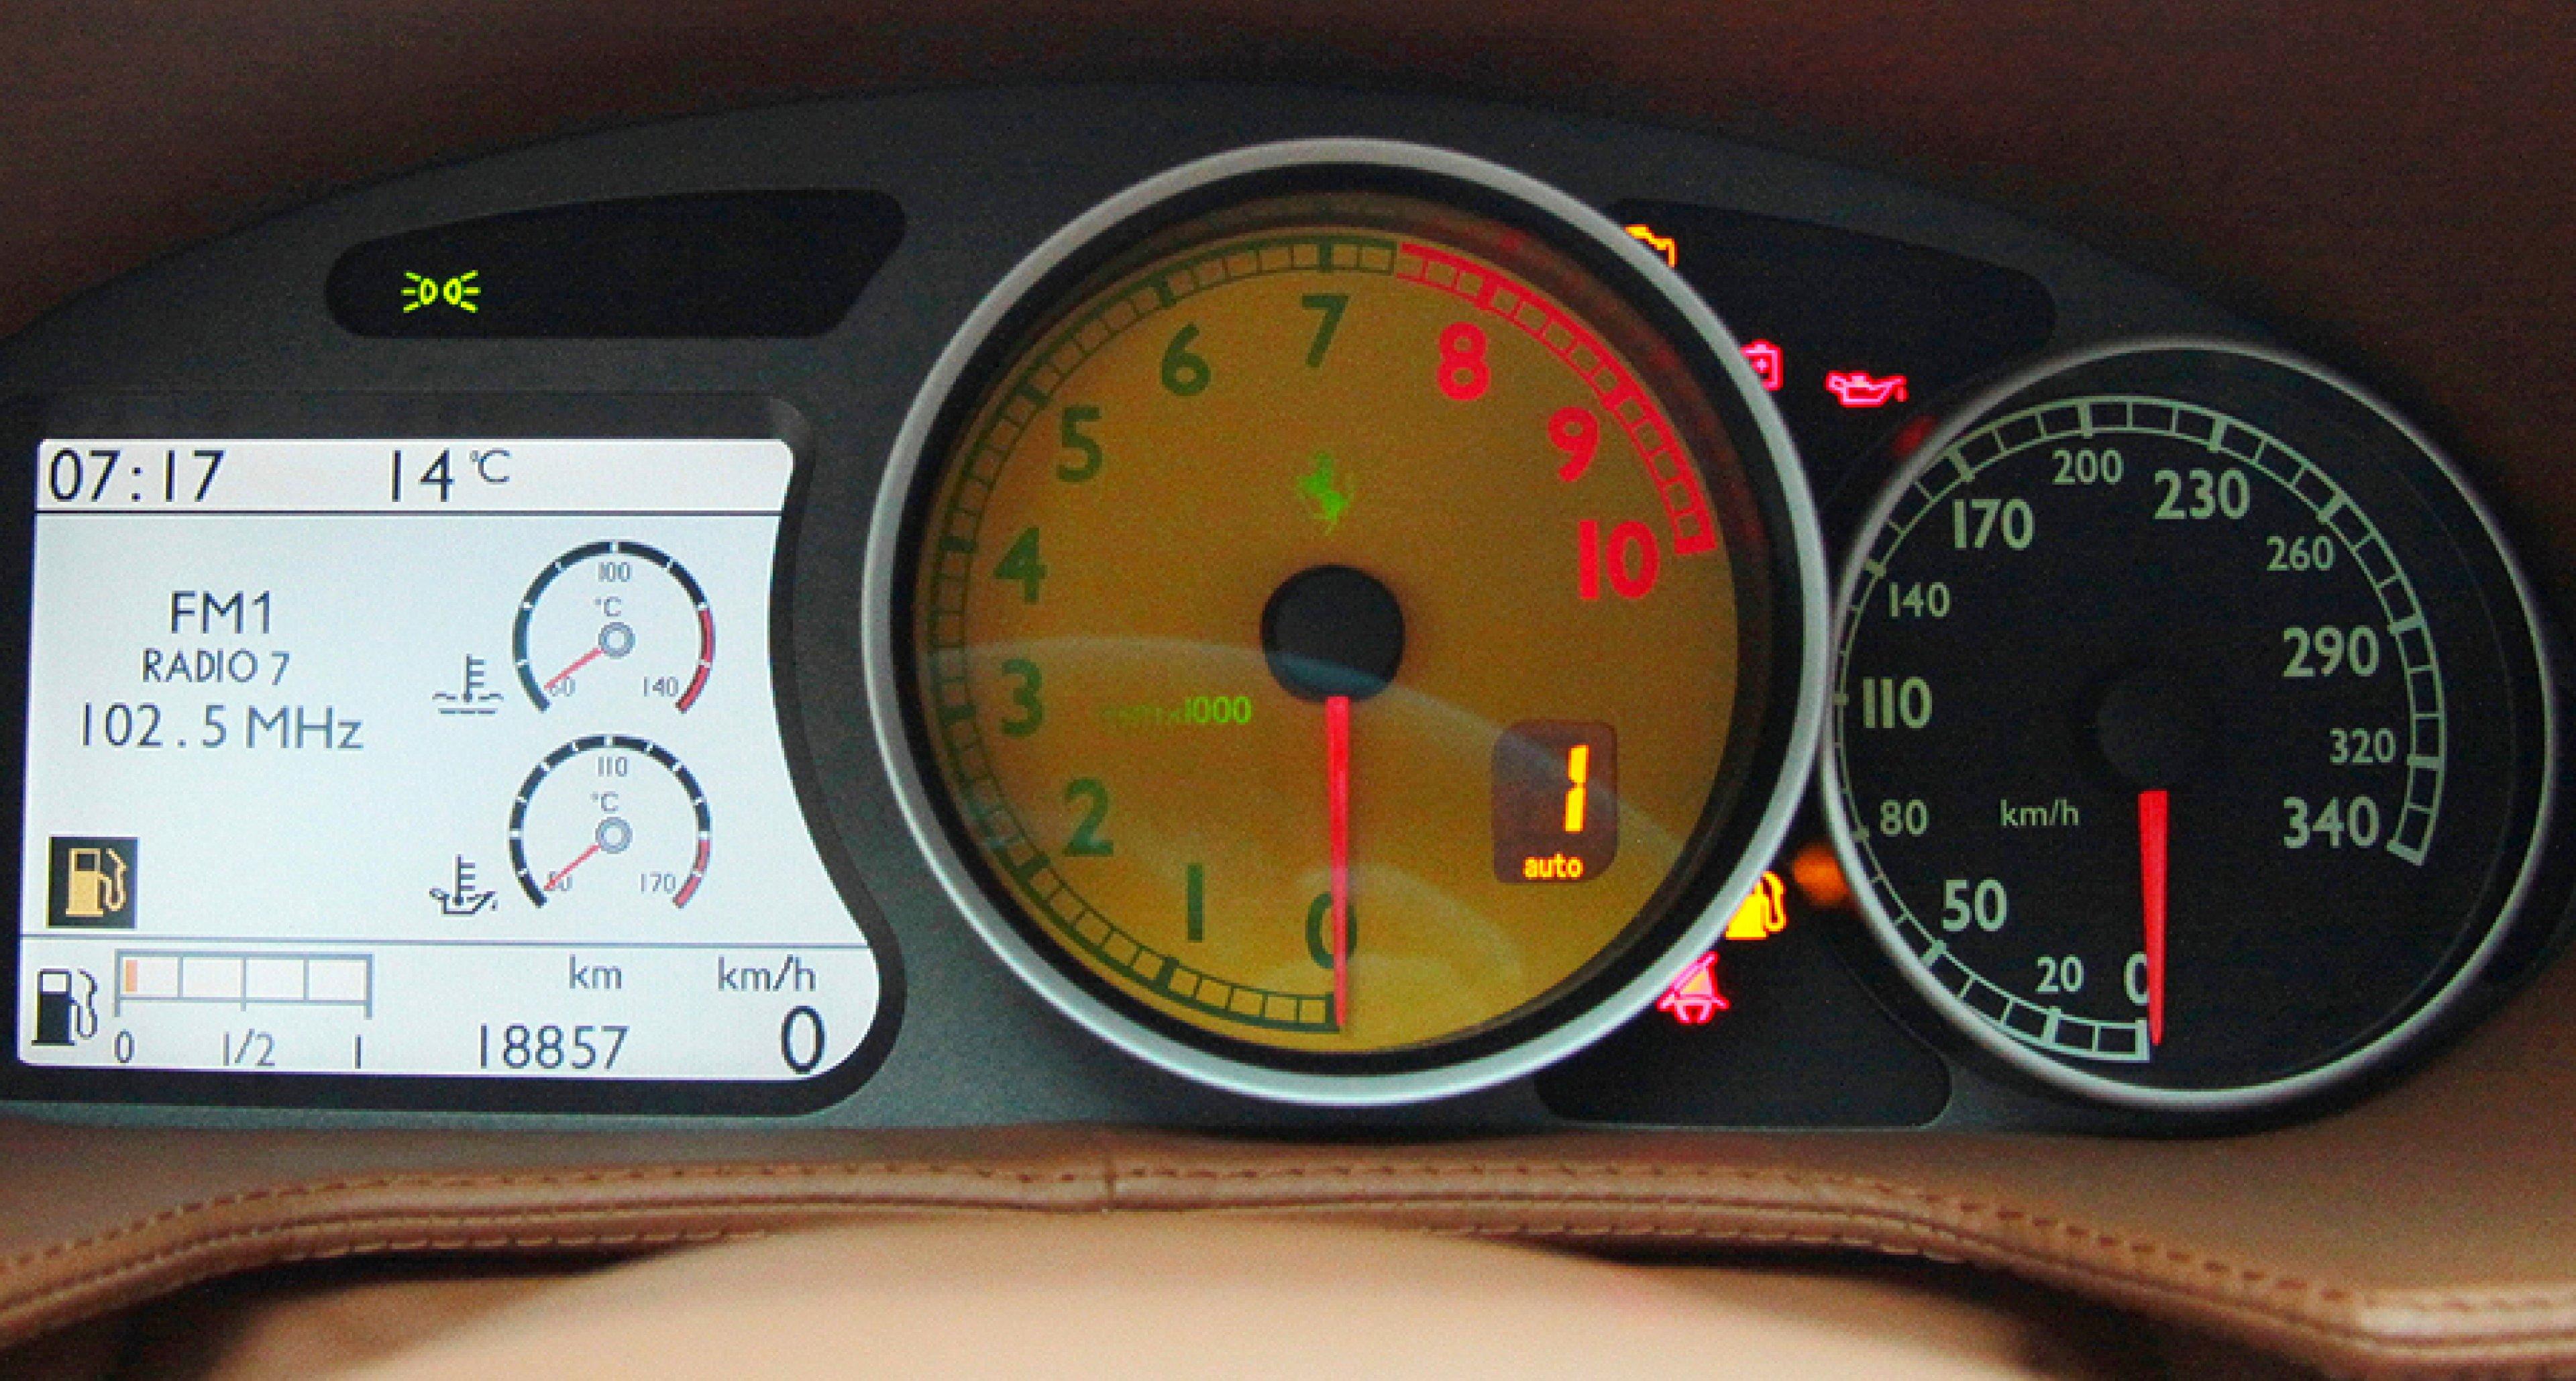 Ferrari 612 Scaglietti: Der erste Ferrari in Detroit